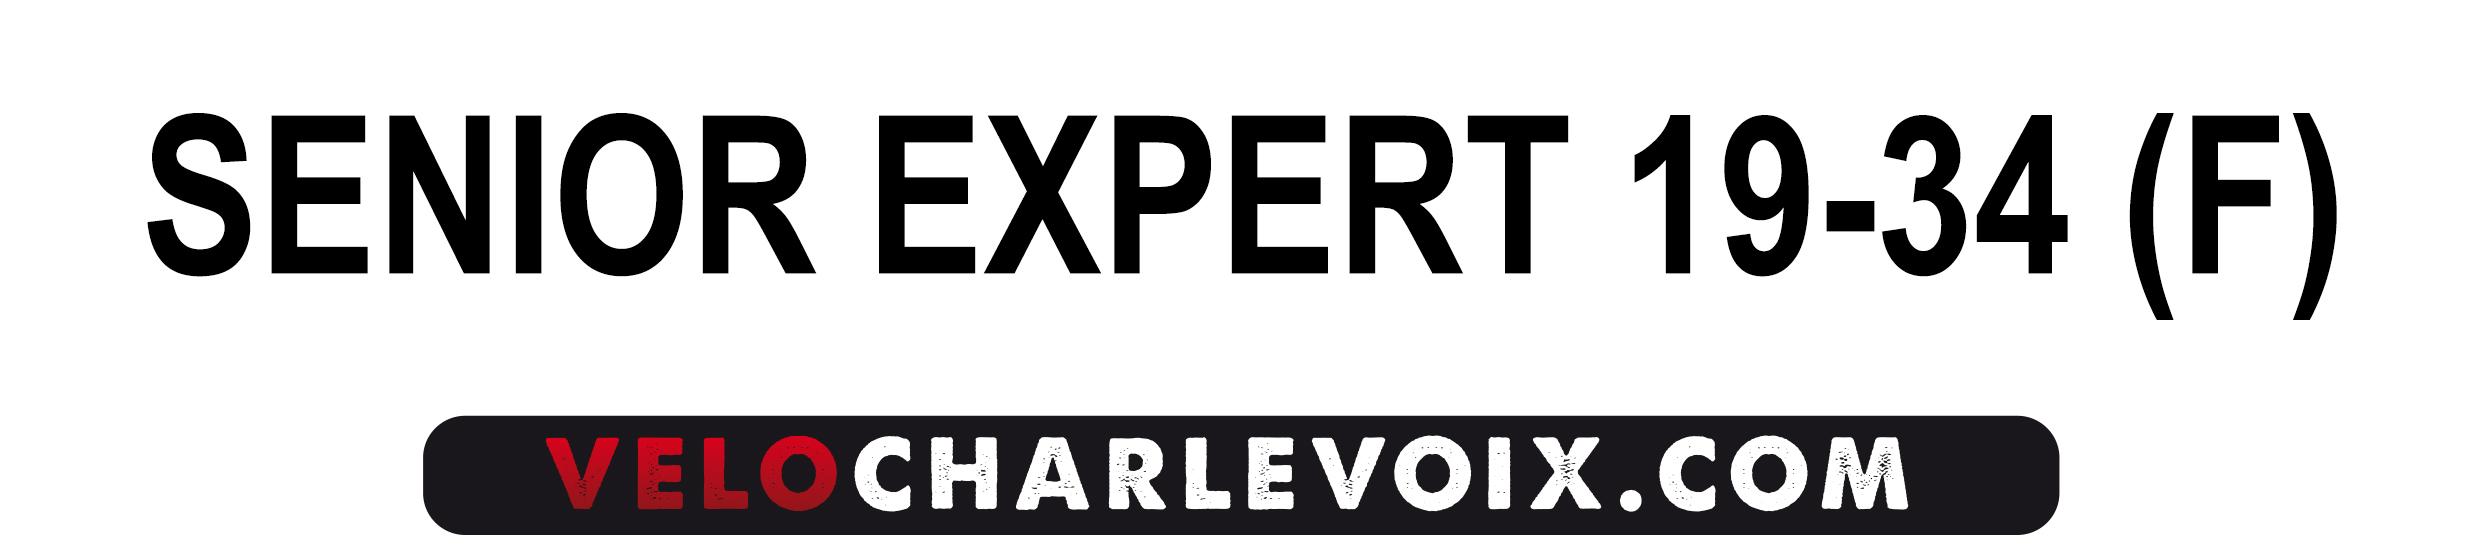 Categories Box Qc_Senior expert 19-34 F